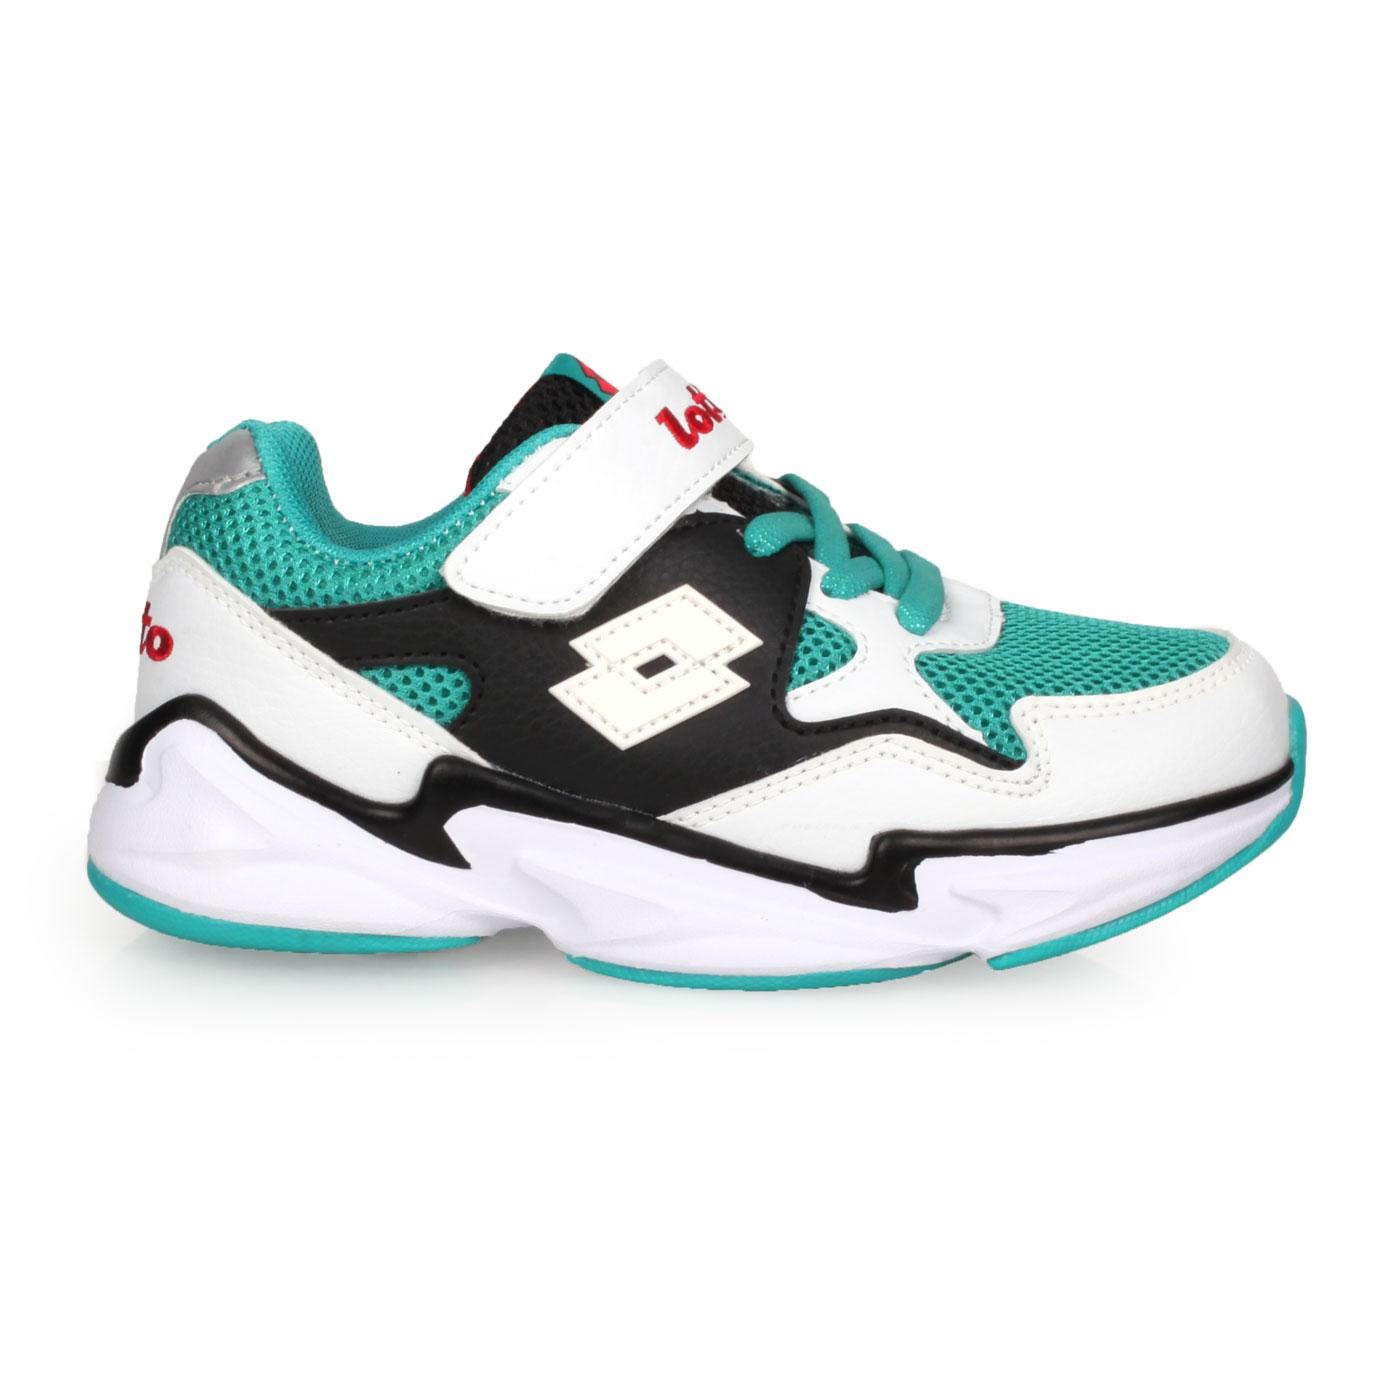 LOTTO 中童復古運動鞋 LT0AKR1773 - 白綠黑